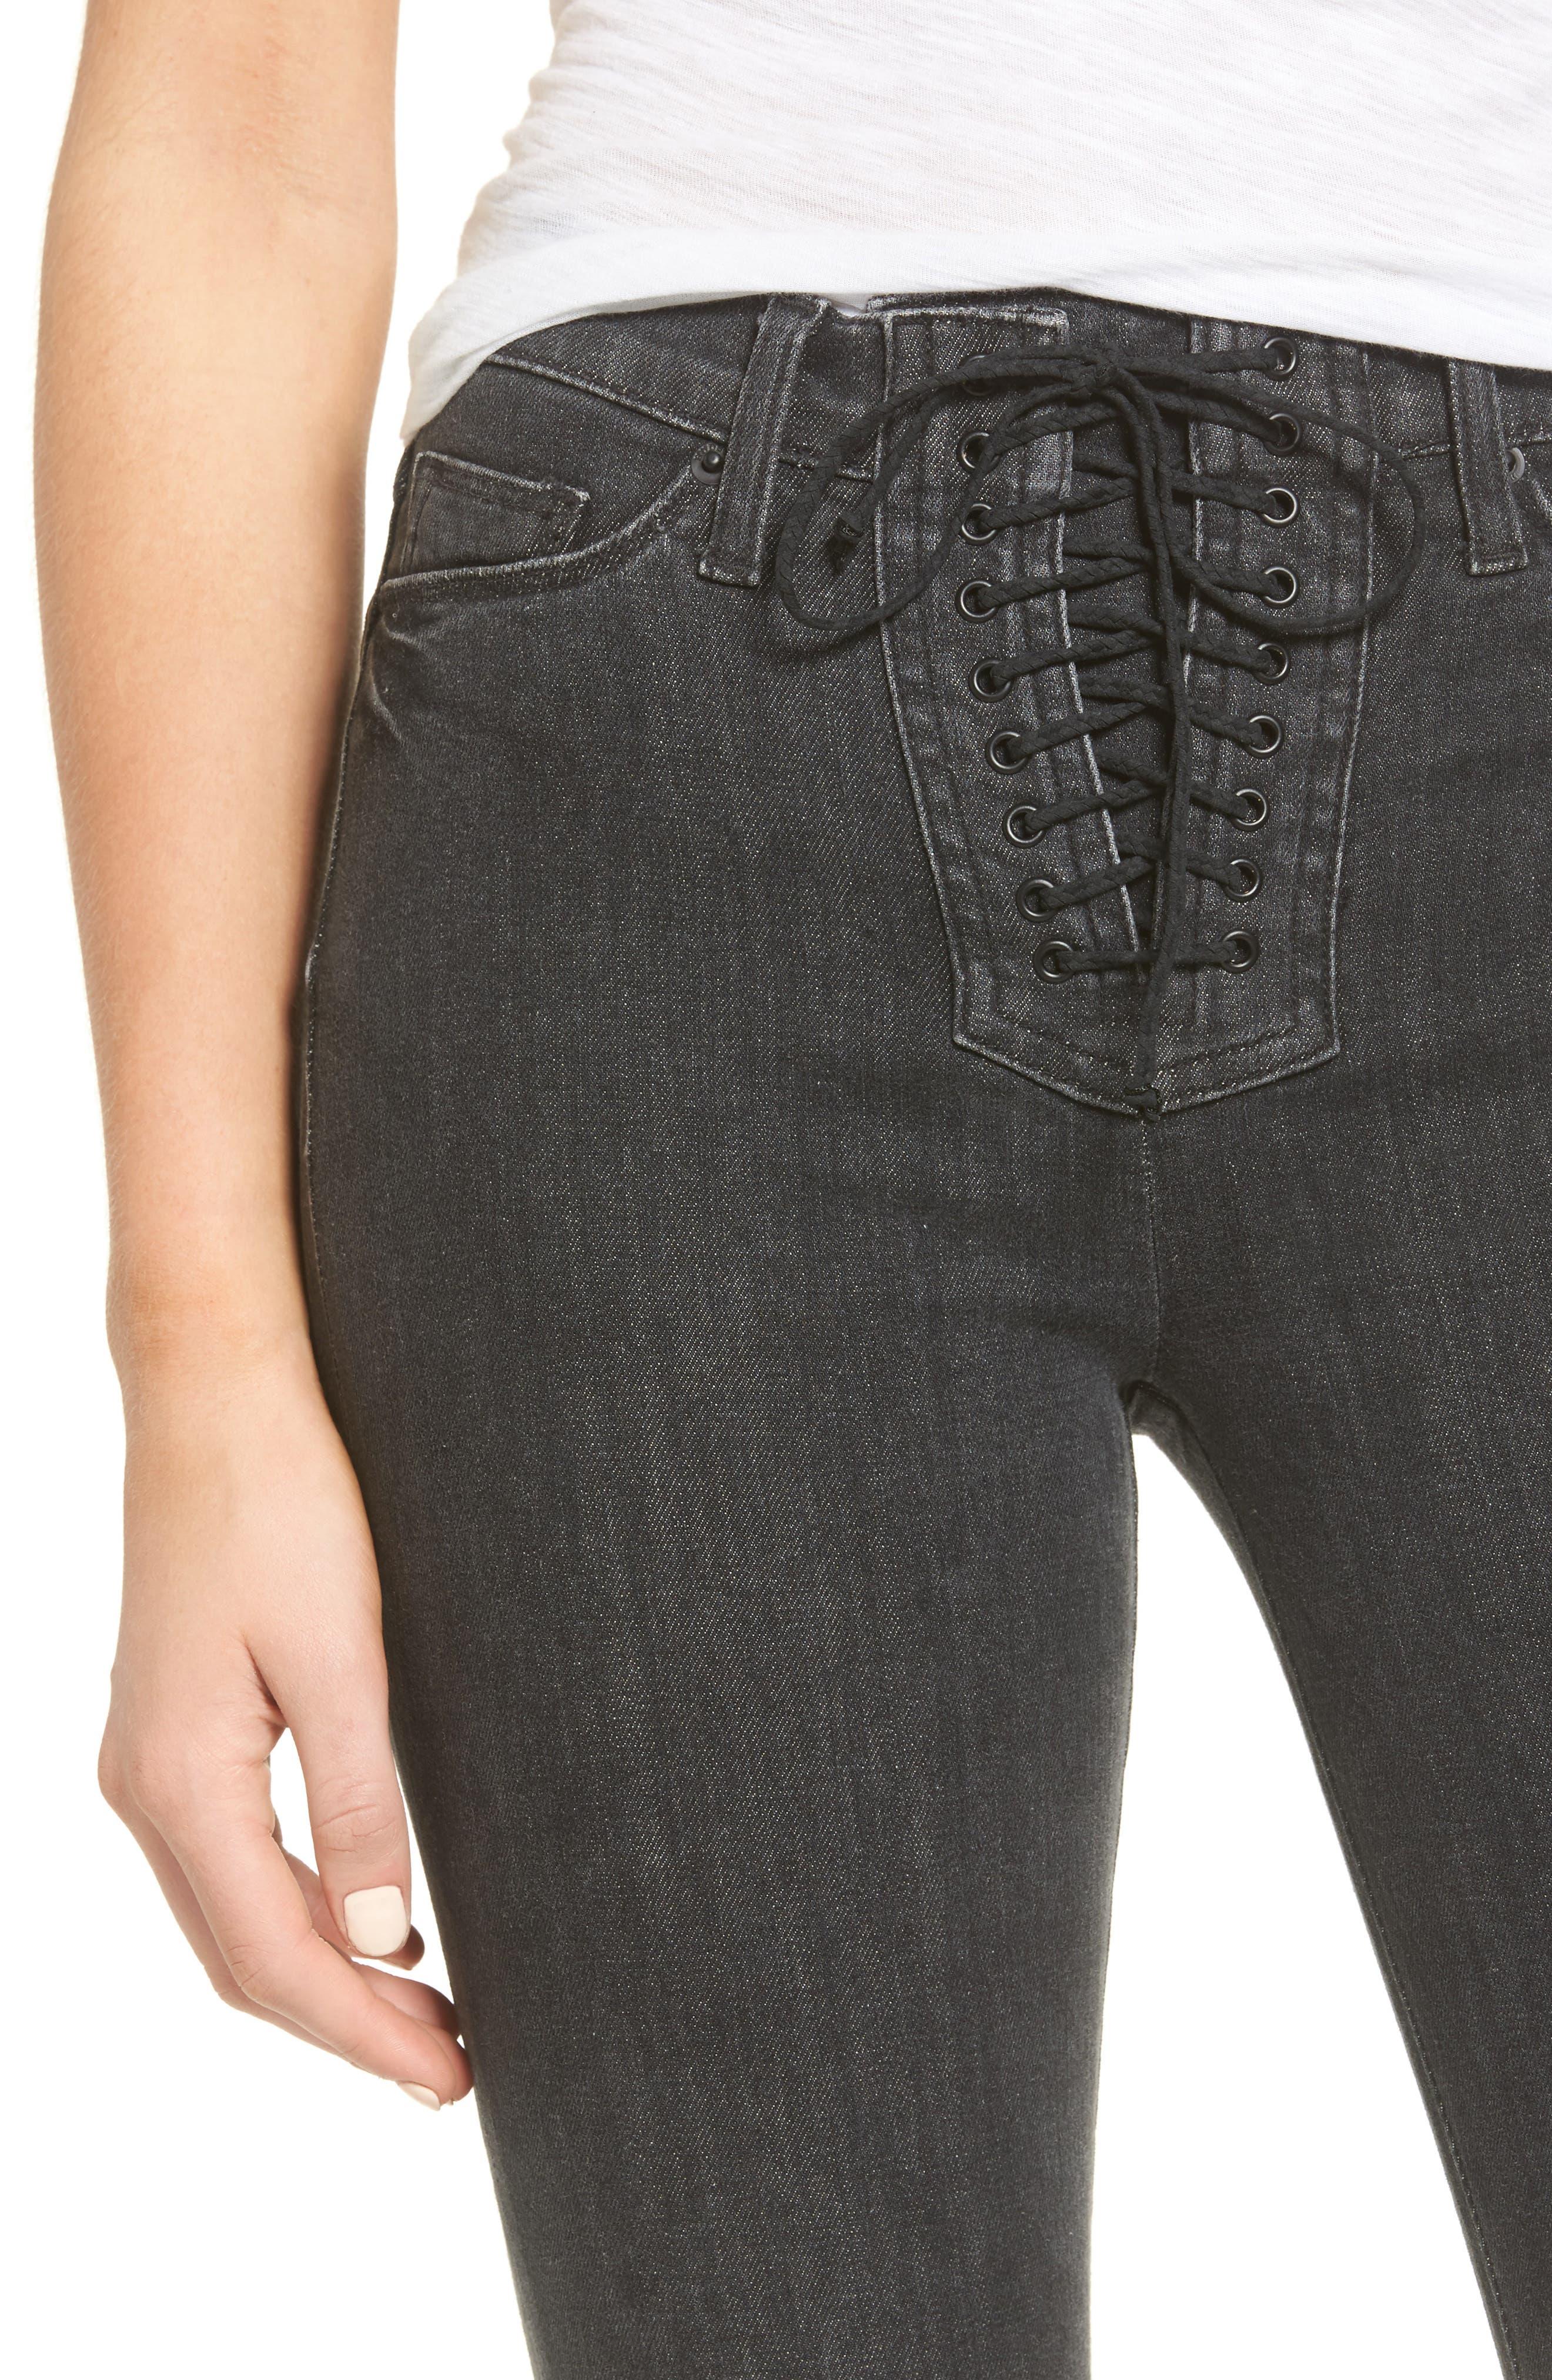 Bullocks High Waist Lace-Up Skinny Jeans,                             Alternate thumbnail 4, color,                             001